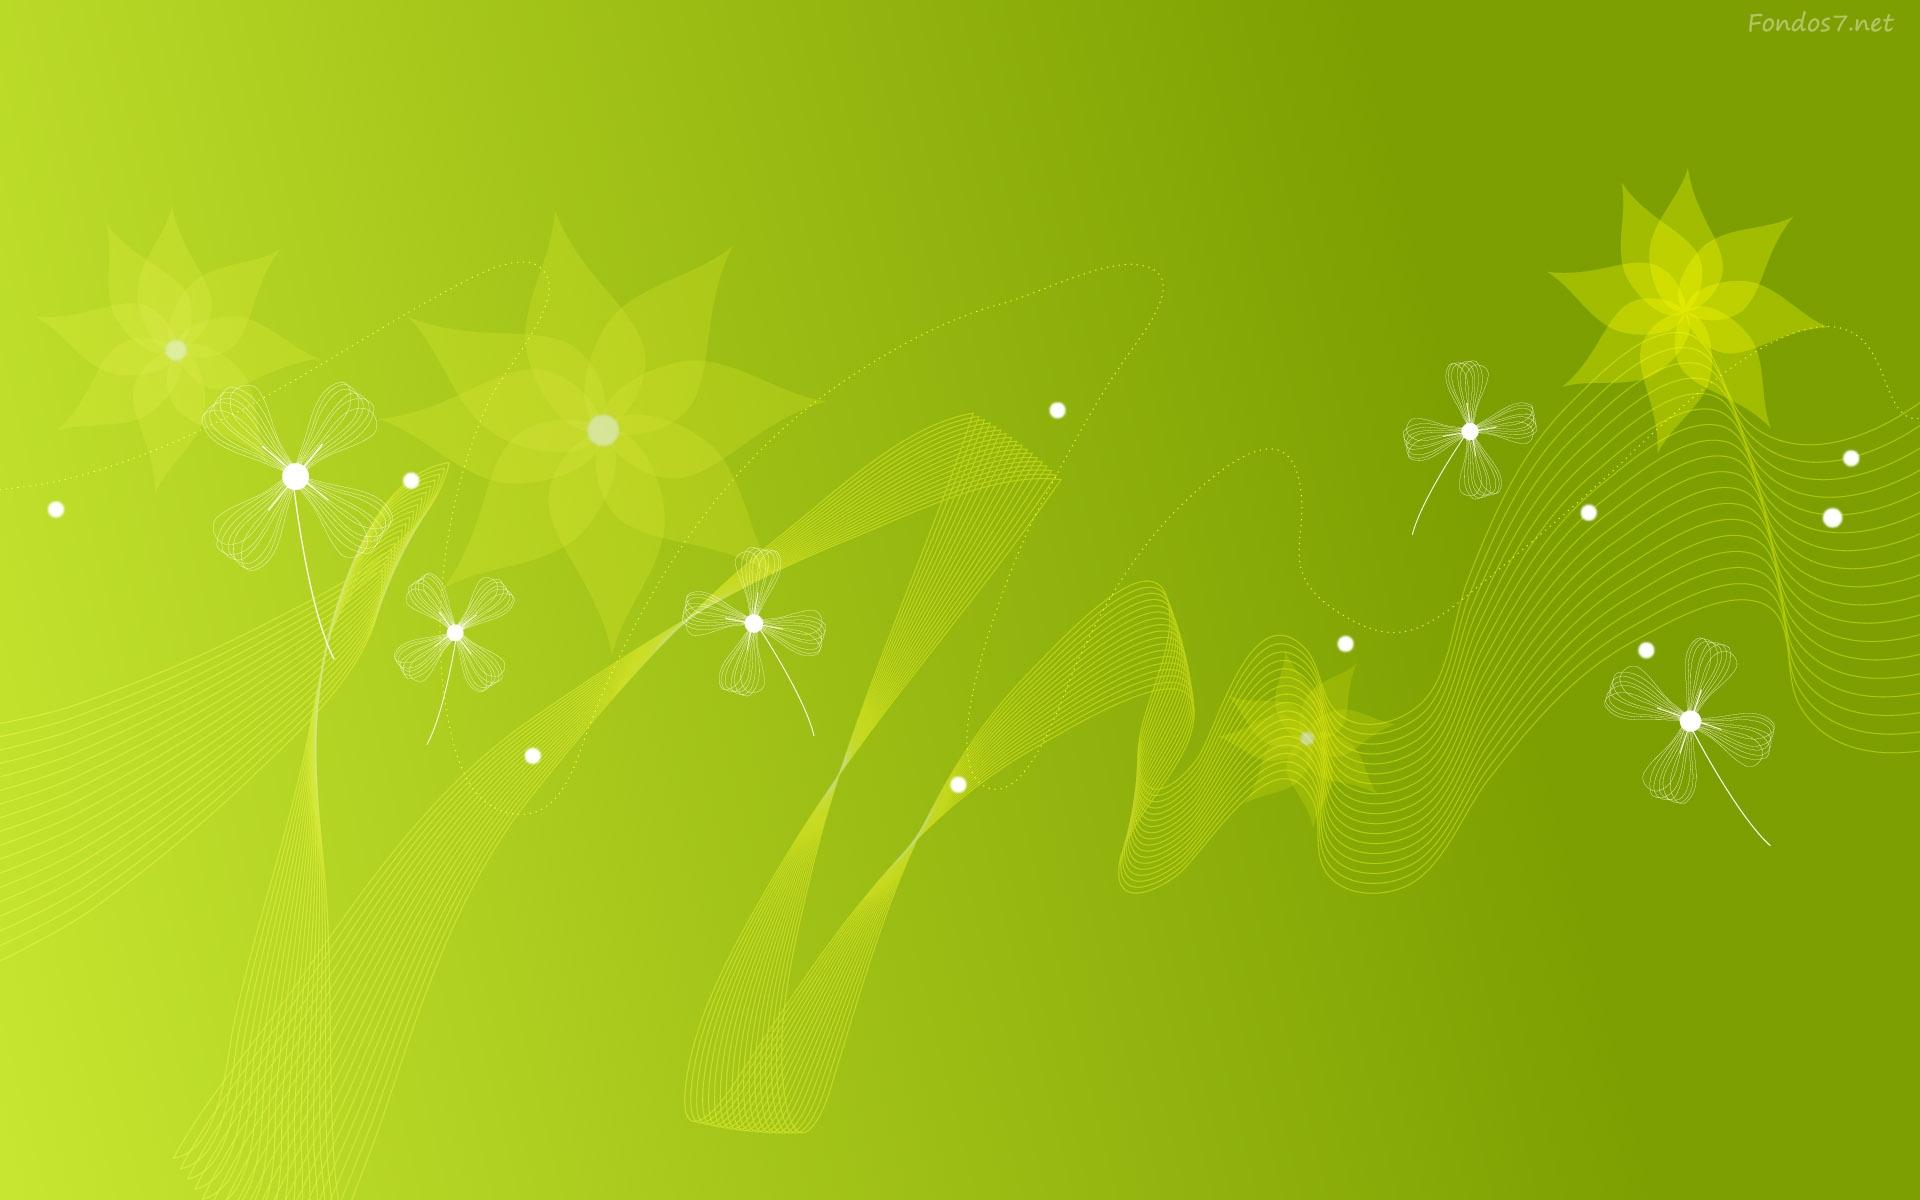 Green wall 1920x1200